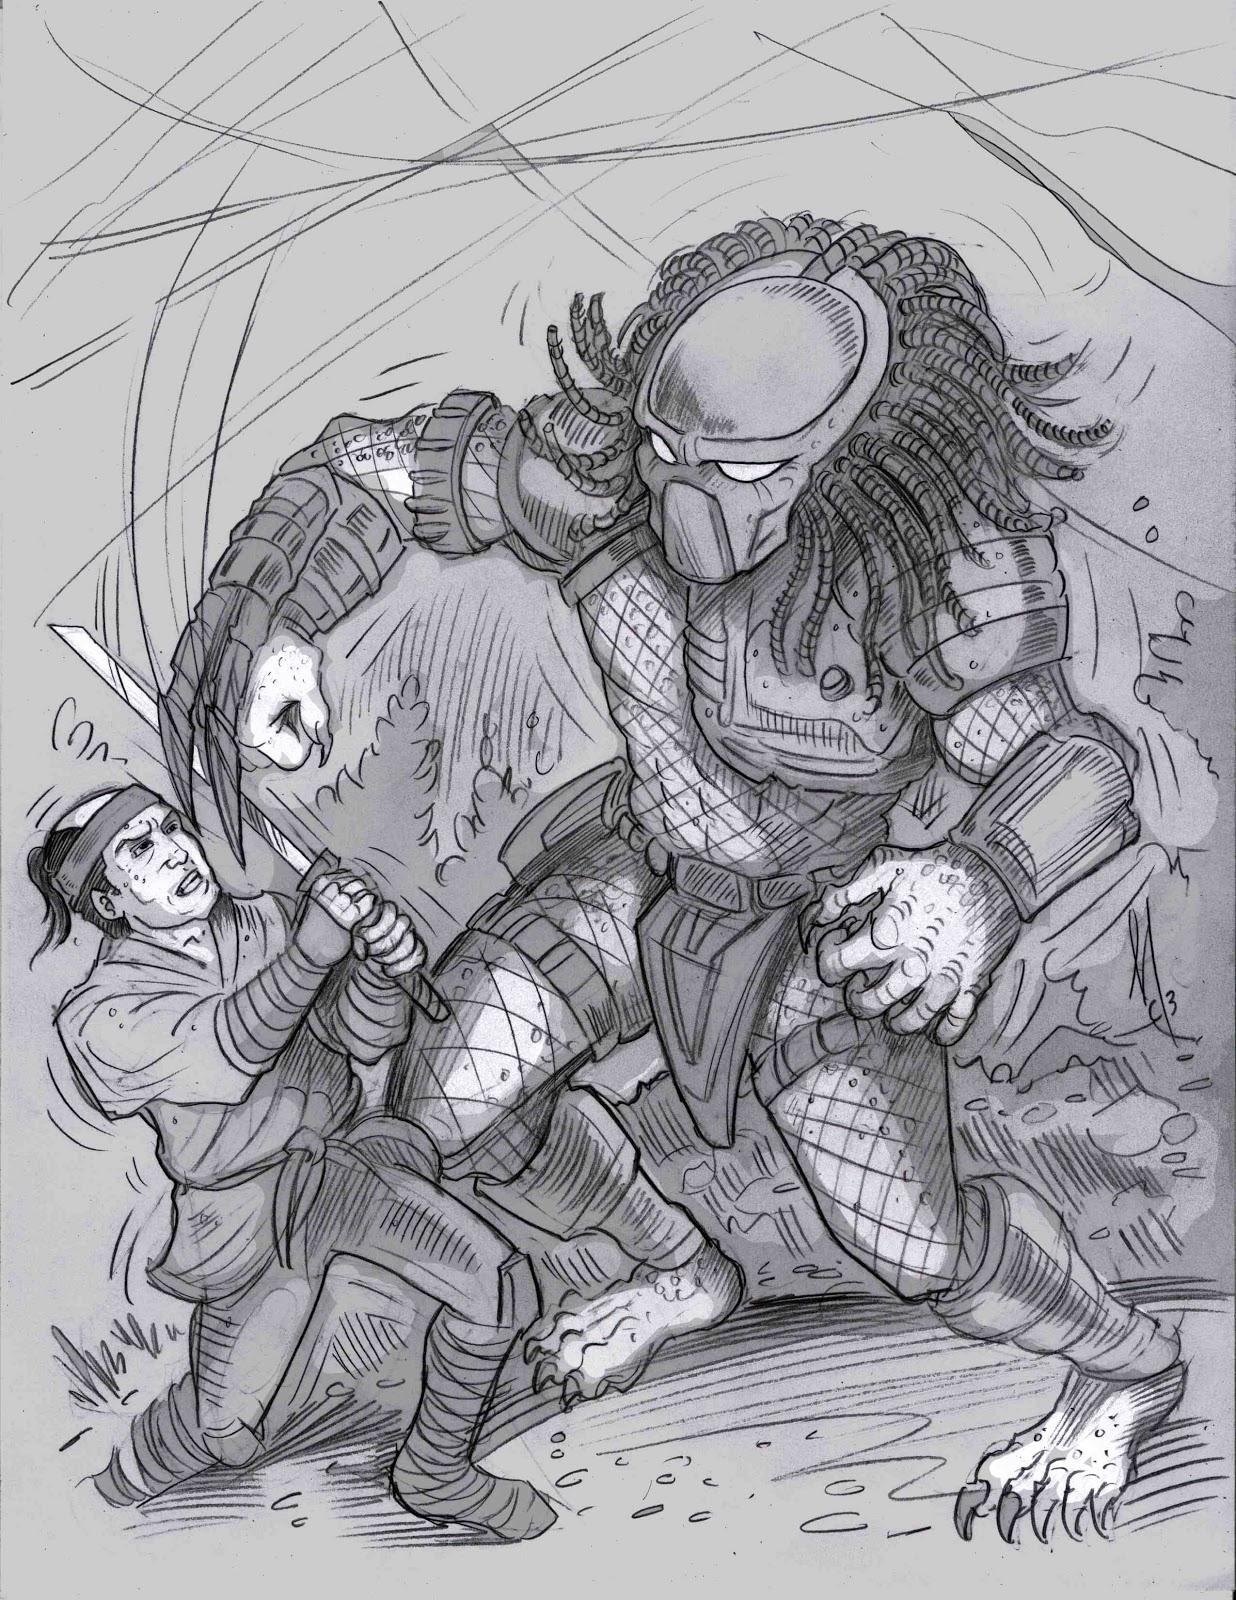 Drawn predator samurai Predator Samurai Marcus Collar vs